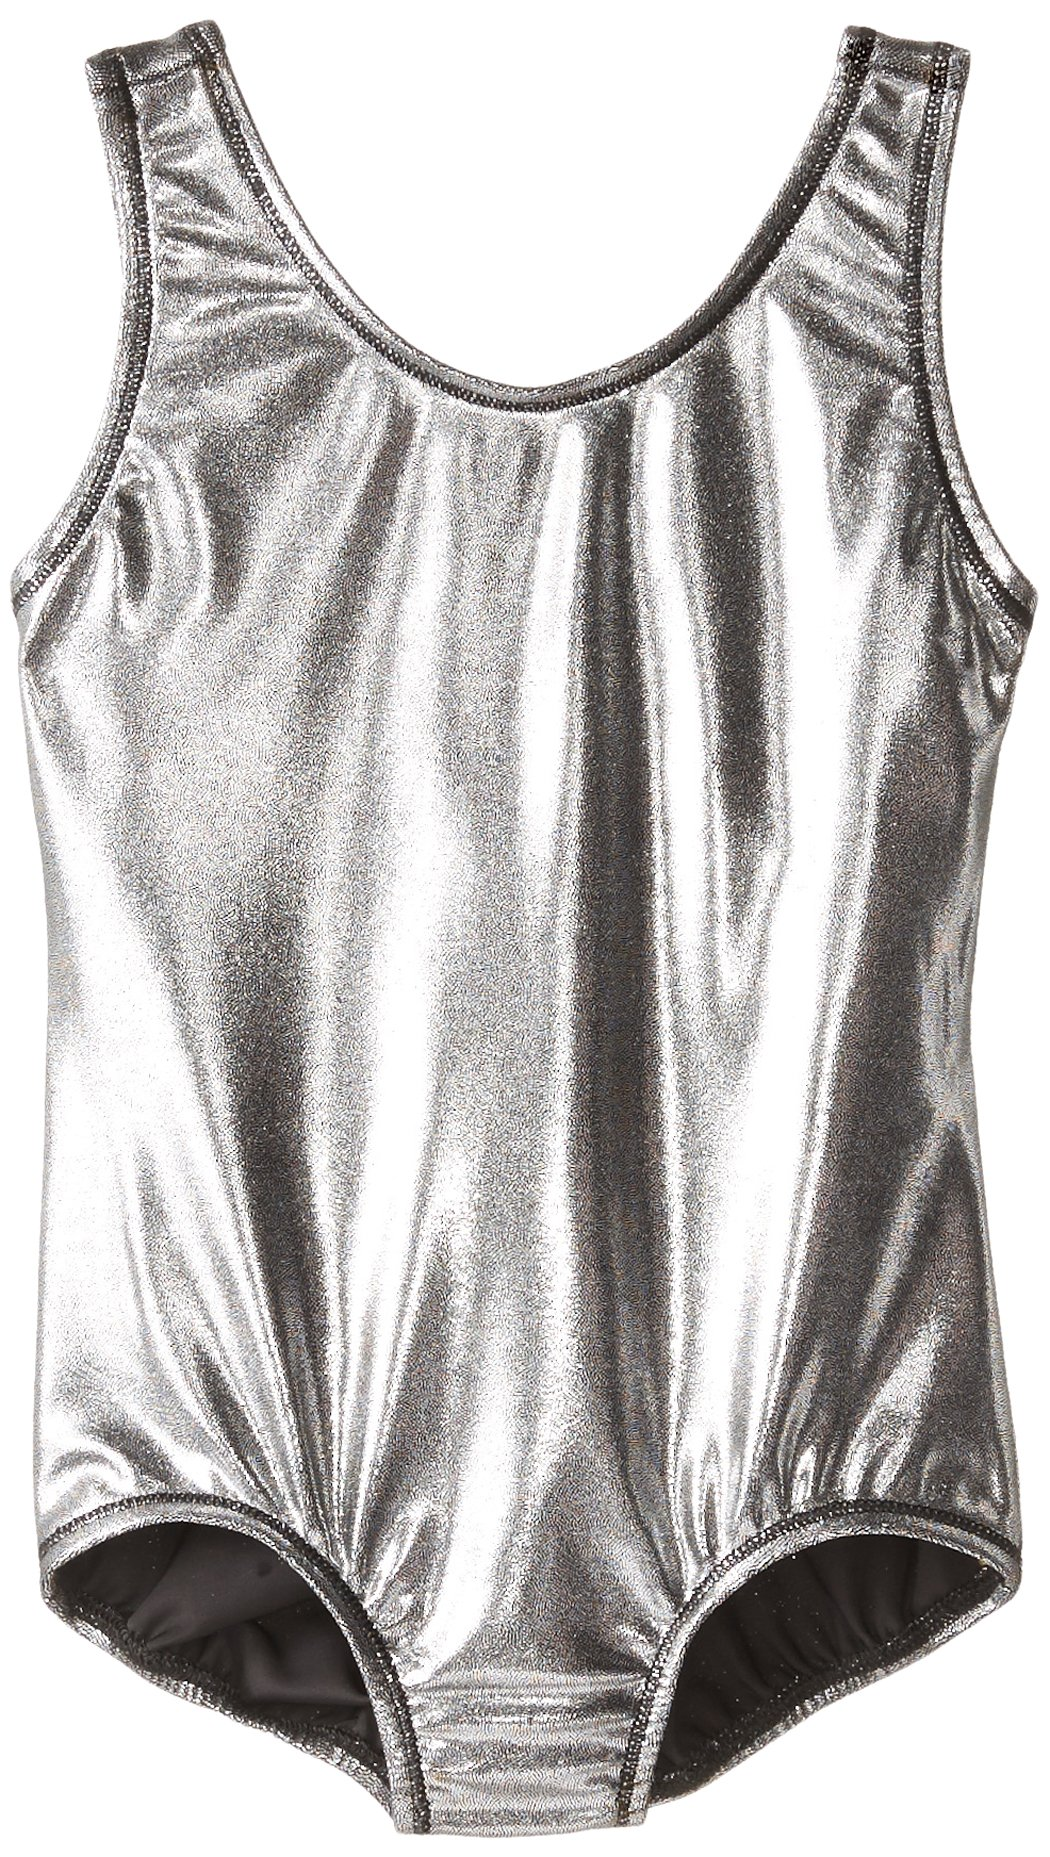 Danskin Little Girls' Gymnastics Solid Sparkle Leotard,Black/Silver,Small (4/6)